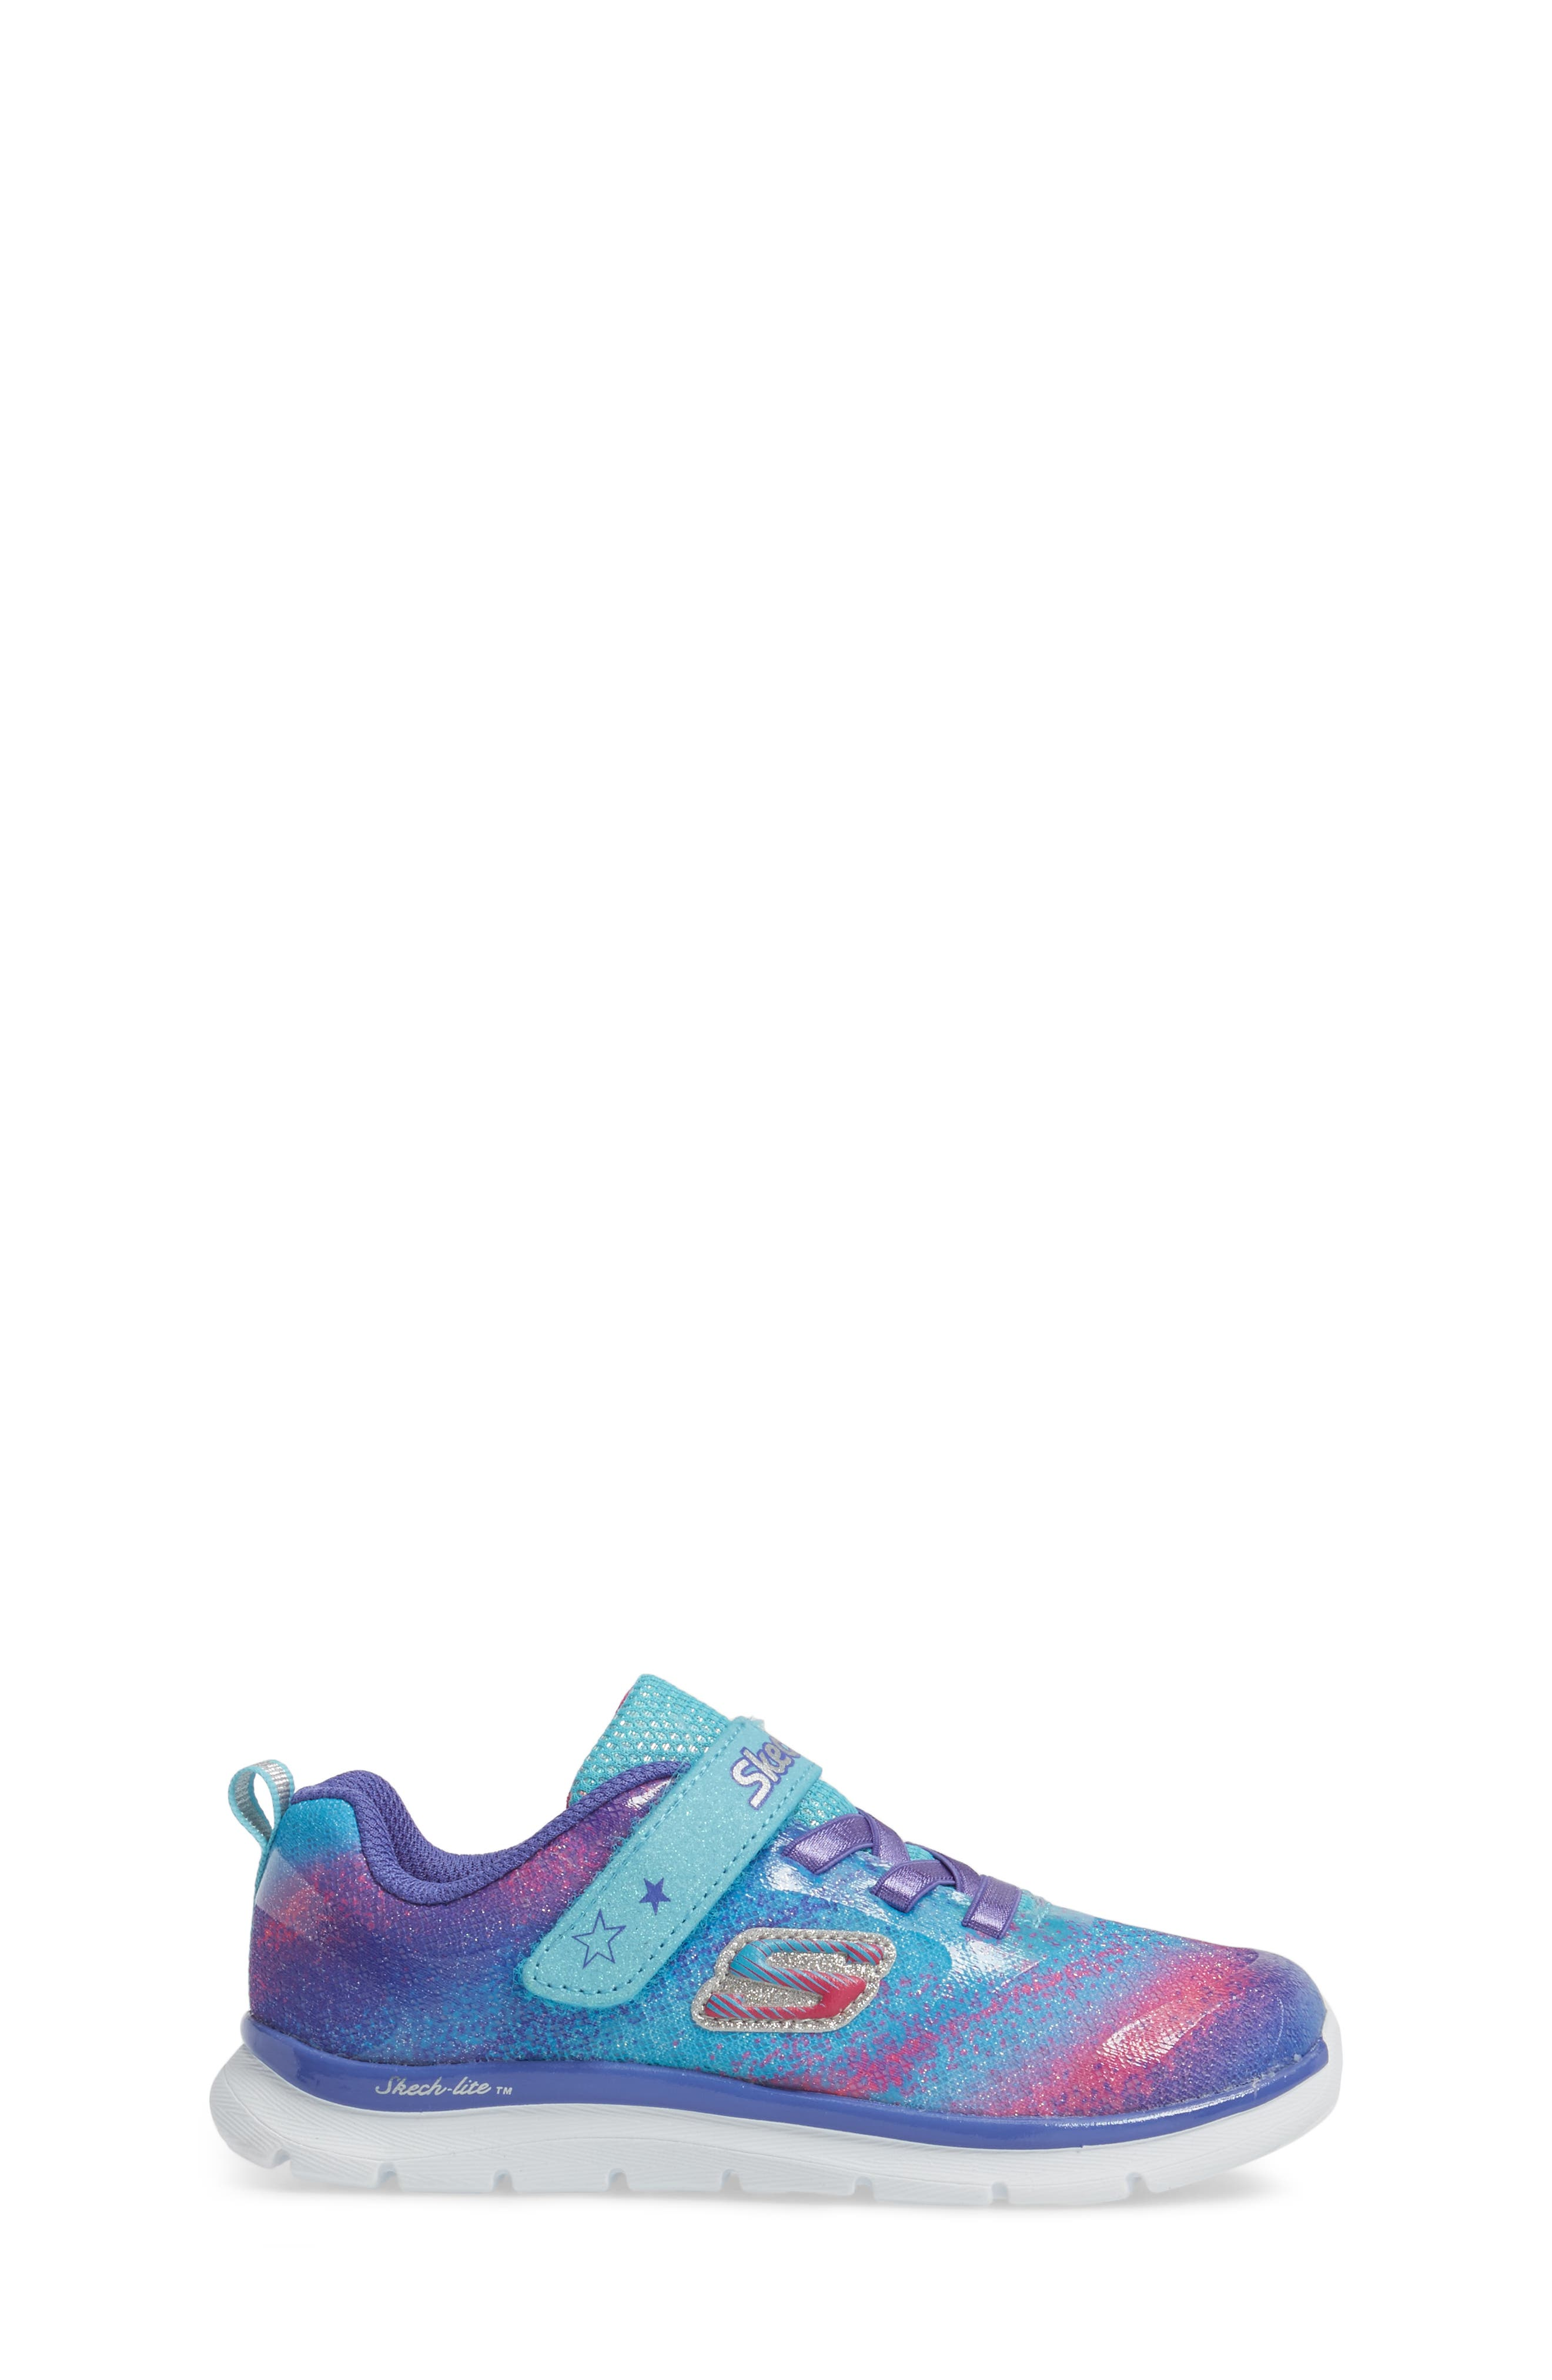 Skech-Lite Colorful Cutie Sneaker,                             Alternate thumbnail 3, color,                             400